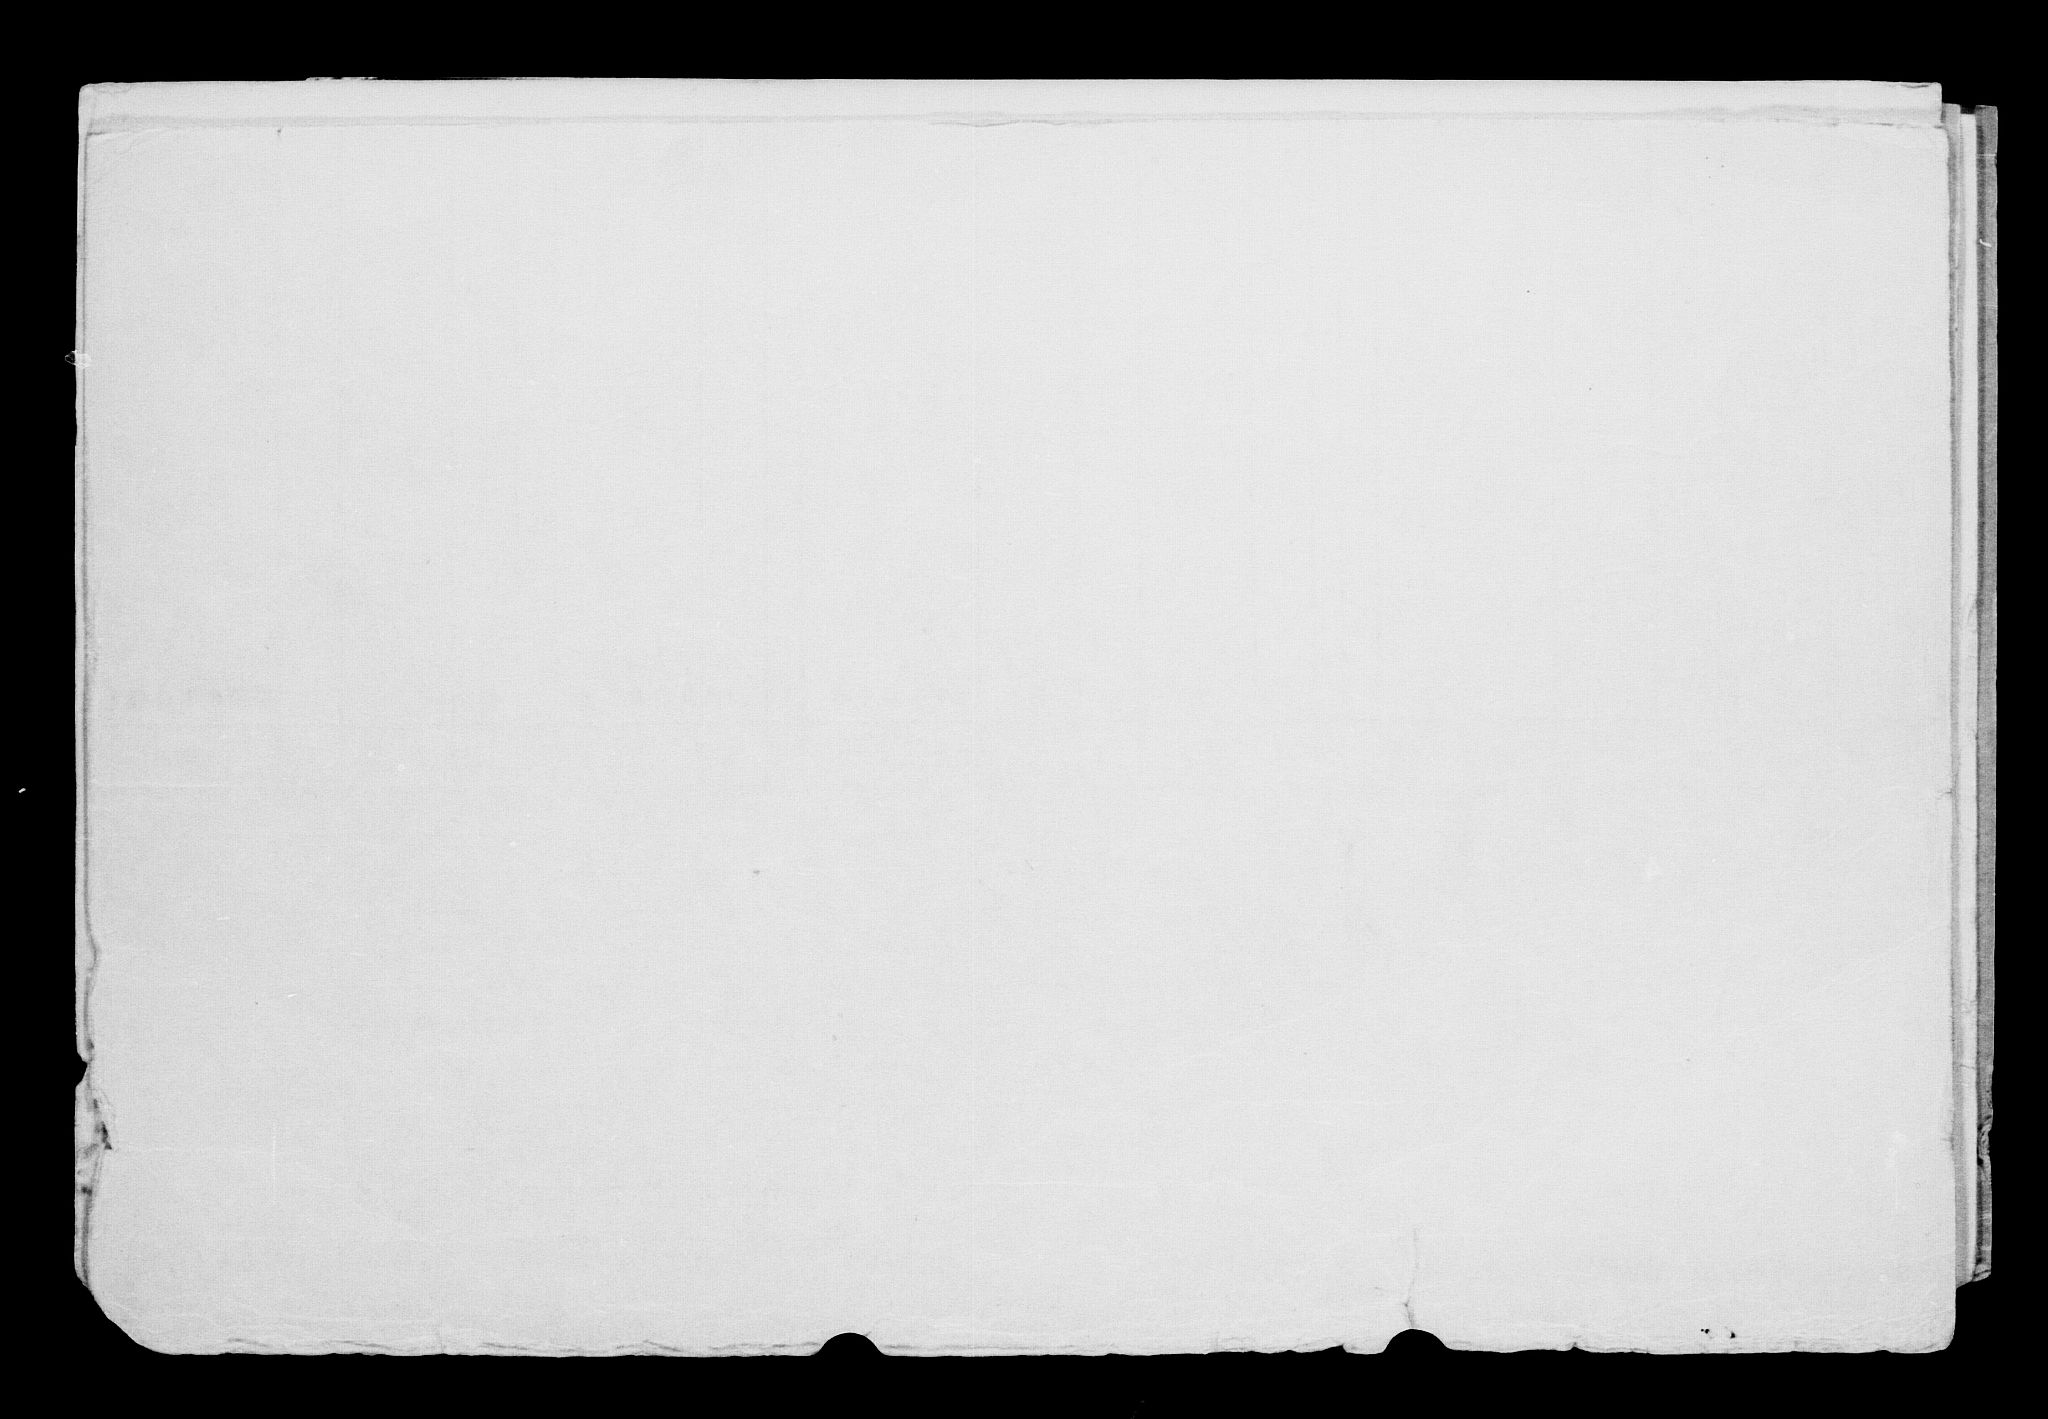 RA, Direktoratet for sjømenn, G/Gb/L0005: Hovedkort, 1888, s. 210